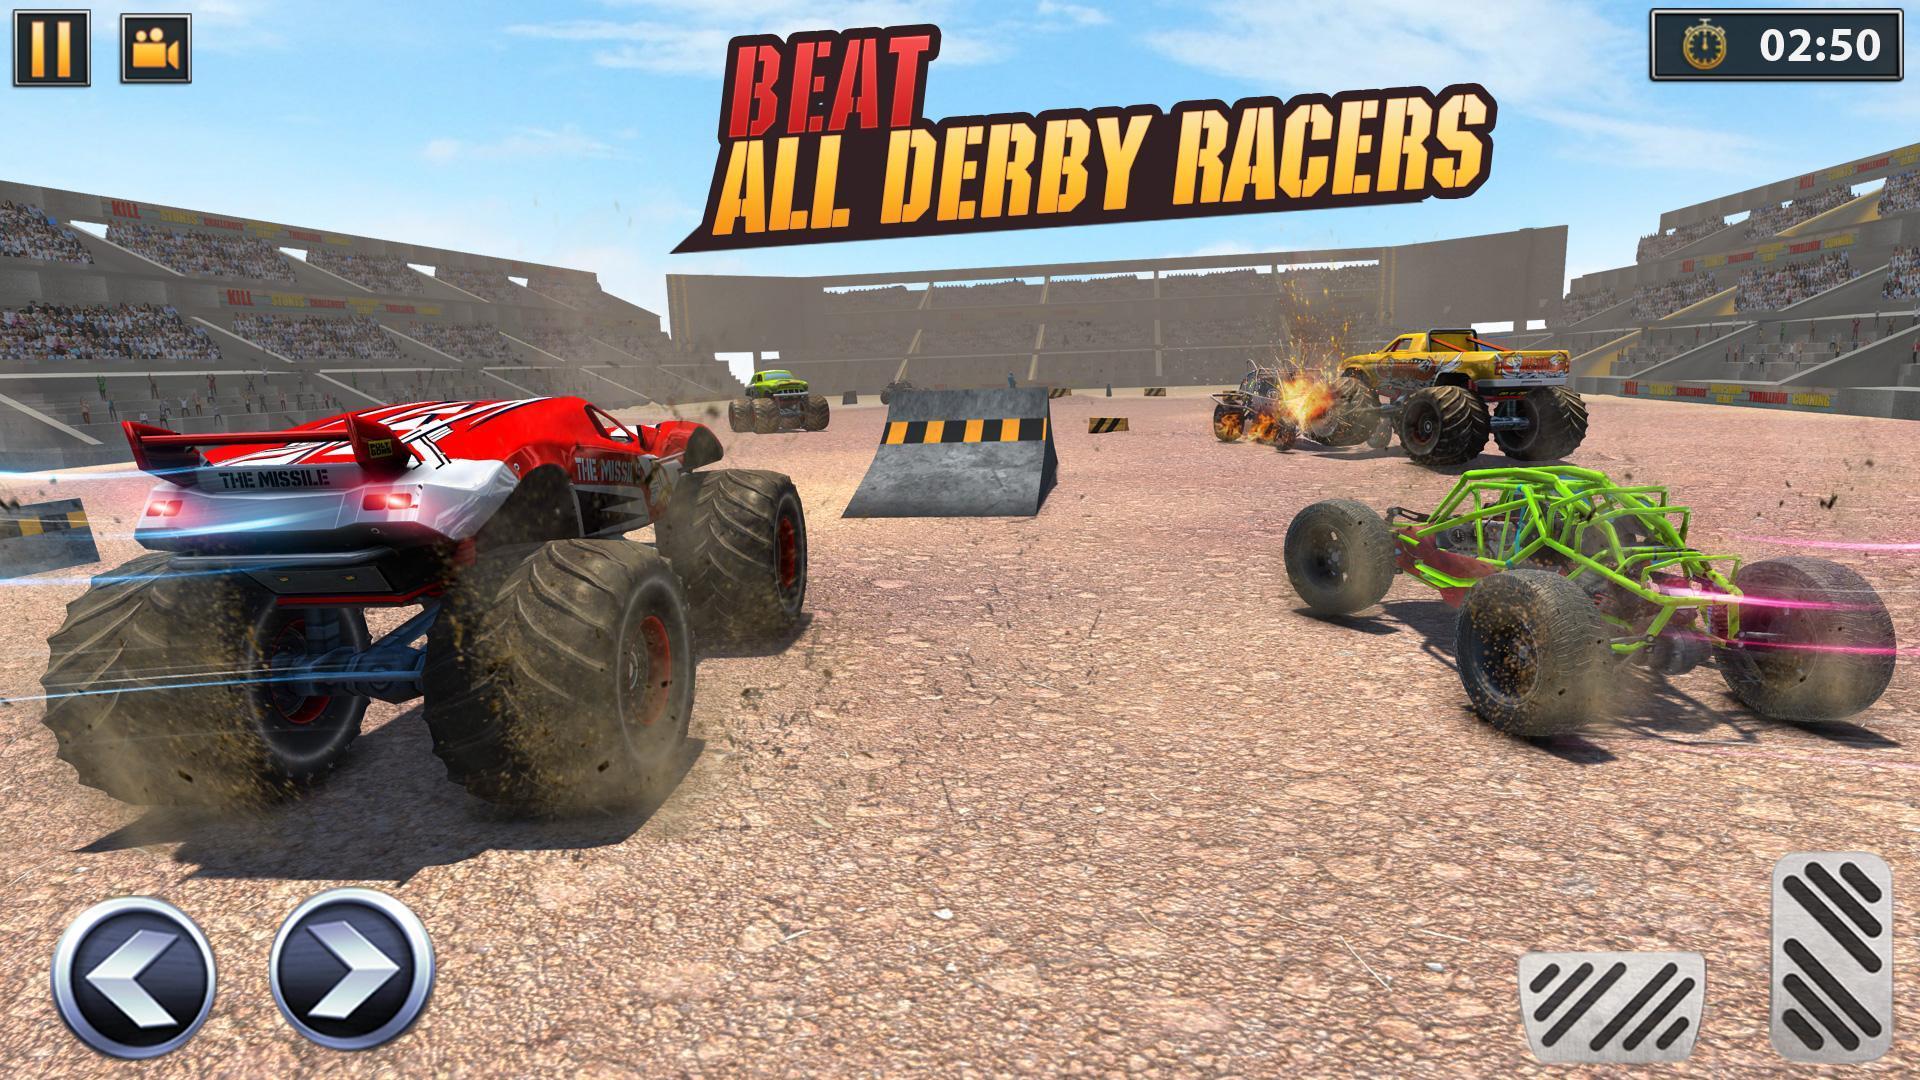 Real Monster Truck Demolition Derby Crash Stunts 3.0.3 Screenshot 13